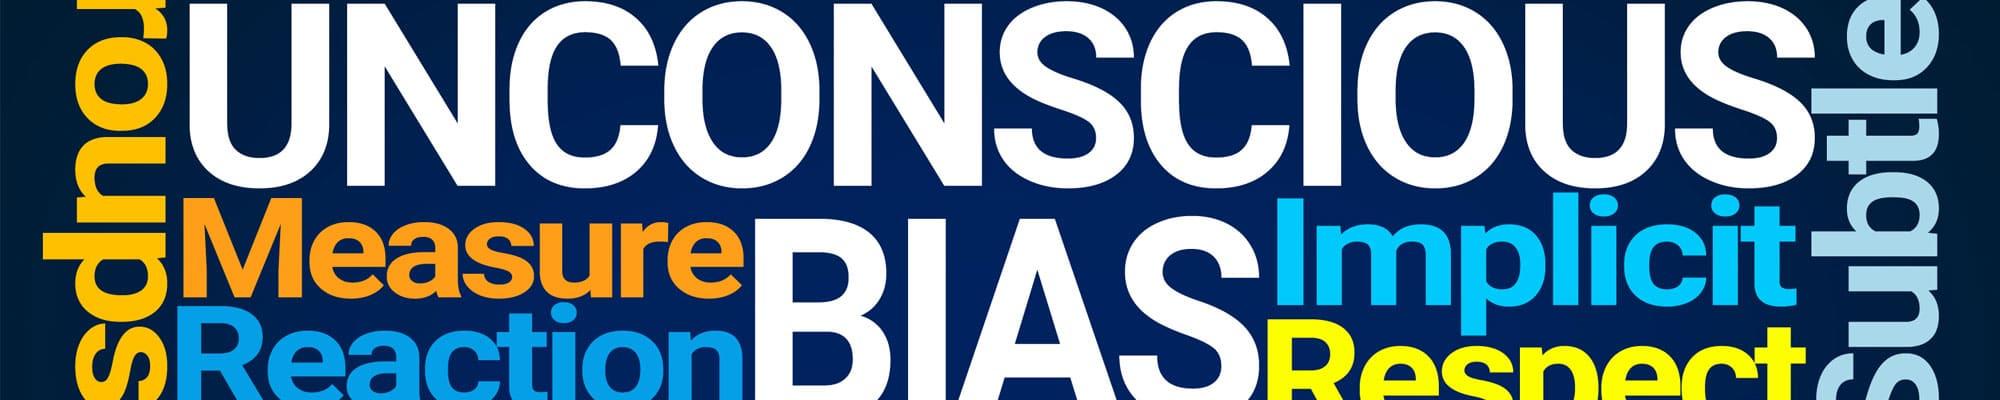 bias in medicine